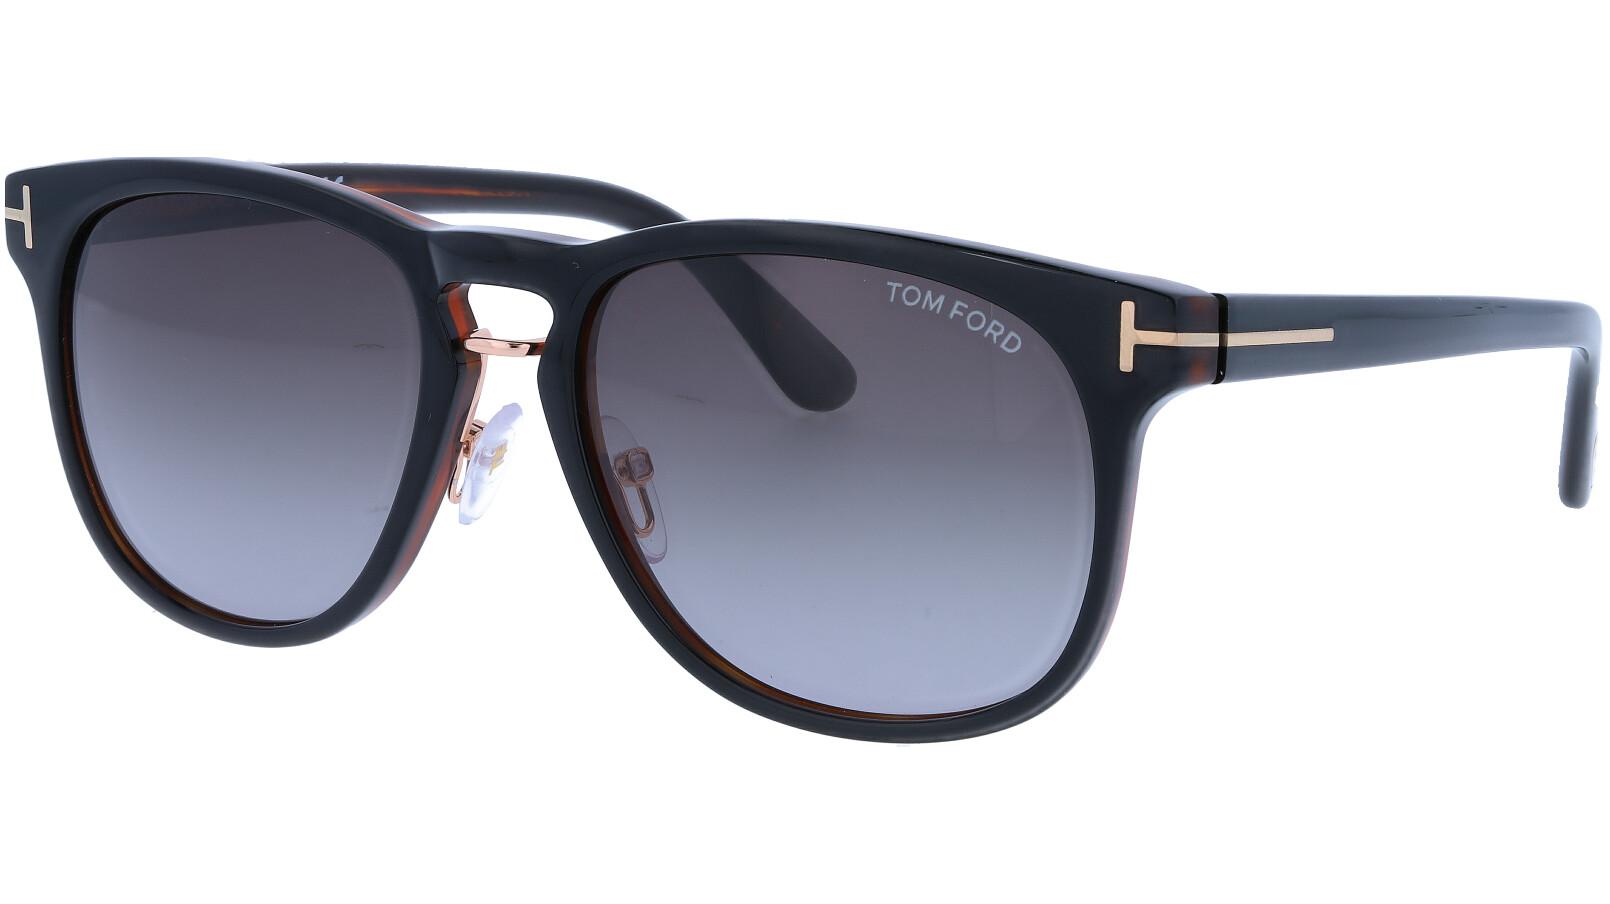 Tom Ford TF346 01V 55 Black Sunglasses